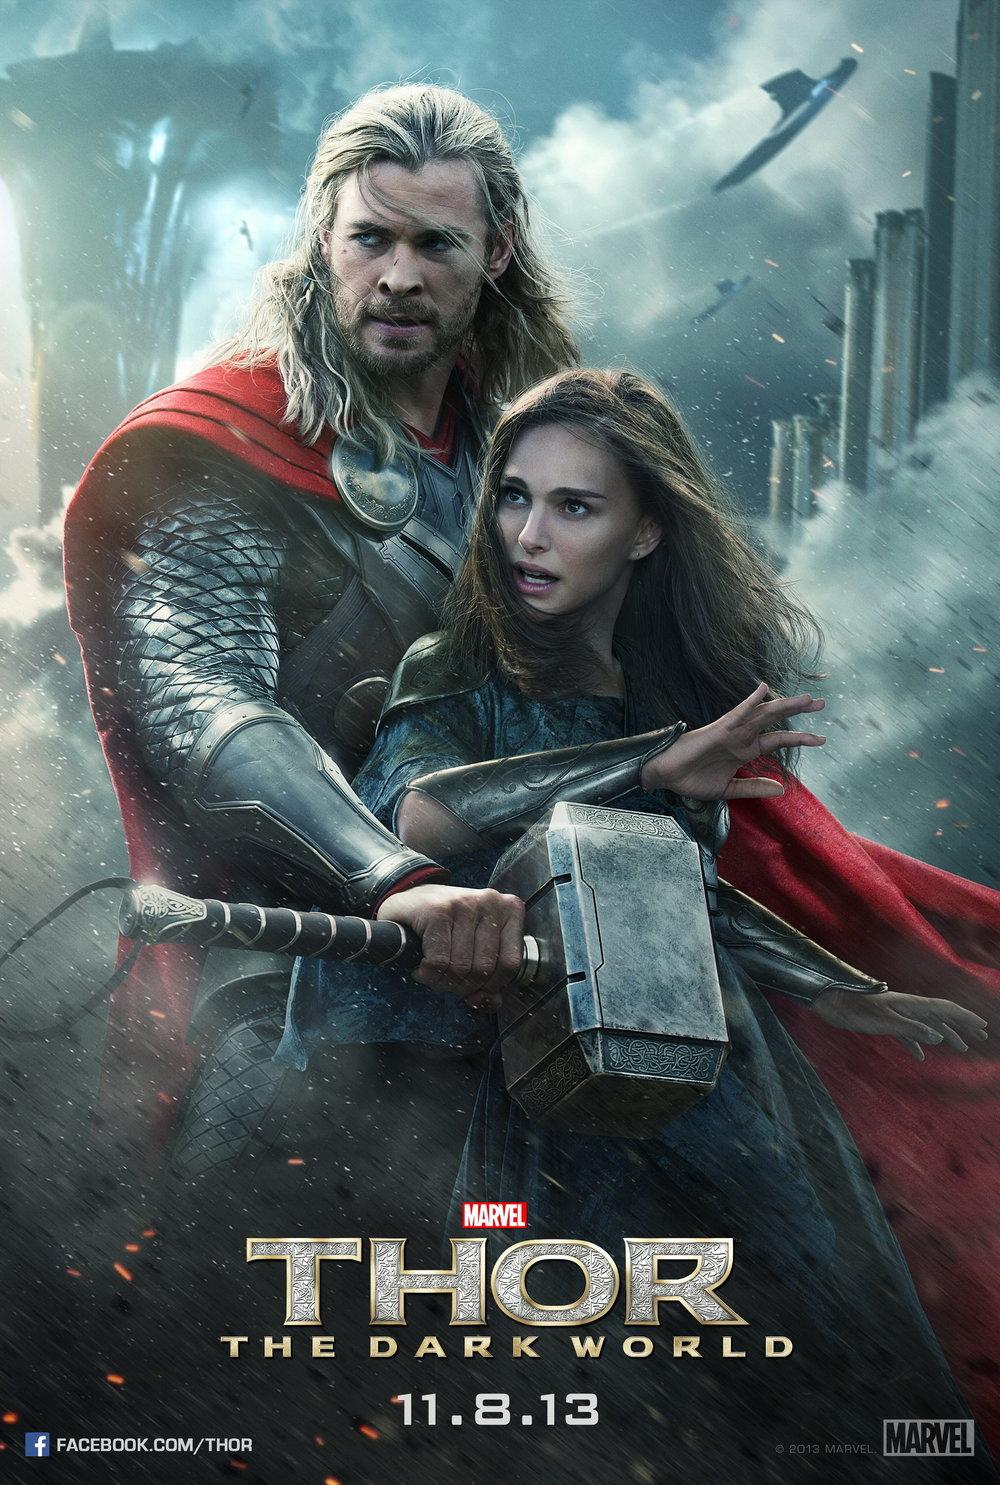 Thor_The_Dark_World_poster_006.jpg